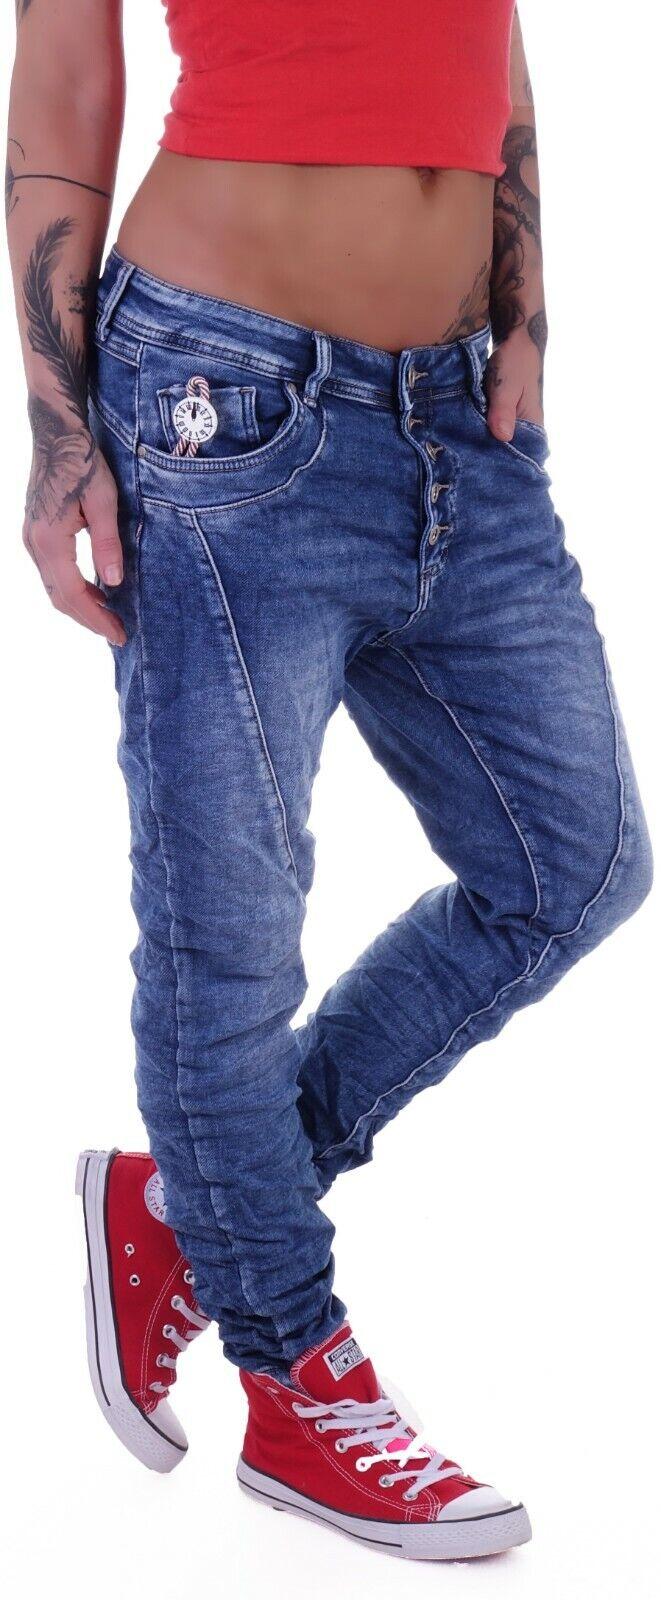 10518 Jeans Femmes Boyfriend Baggy haremscut Jeans Femmes Pantalon Slimfit Bleach